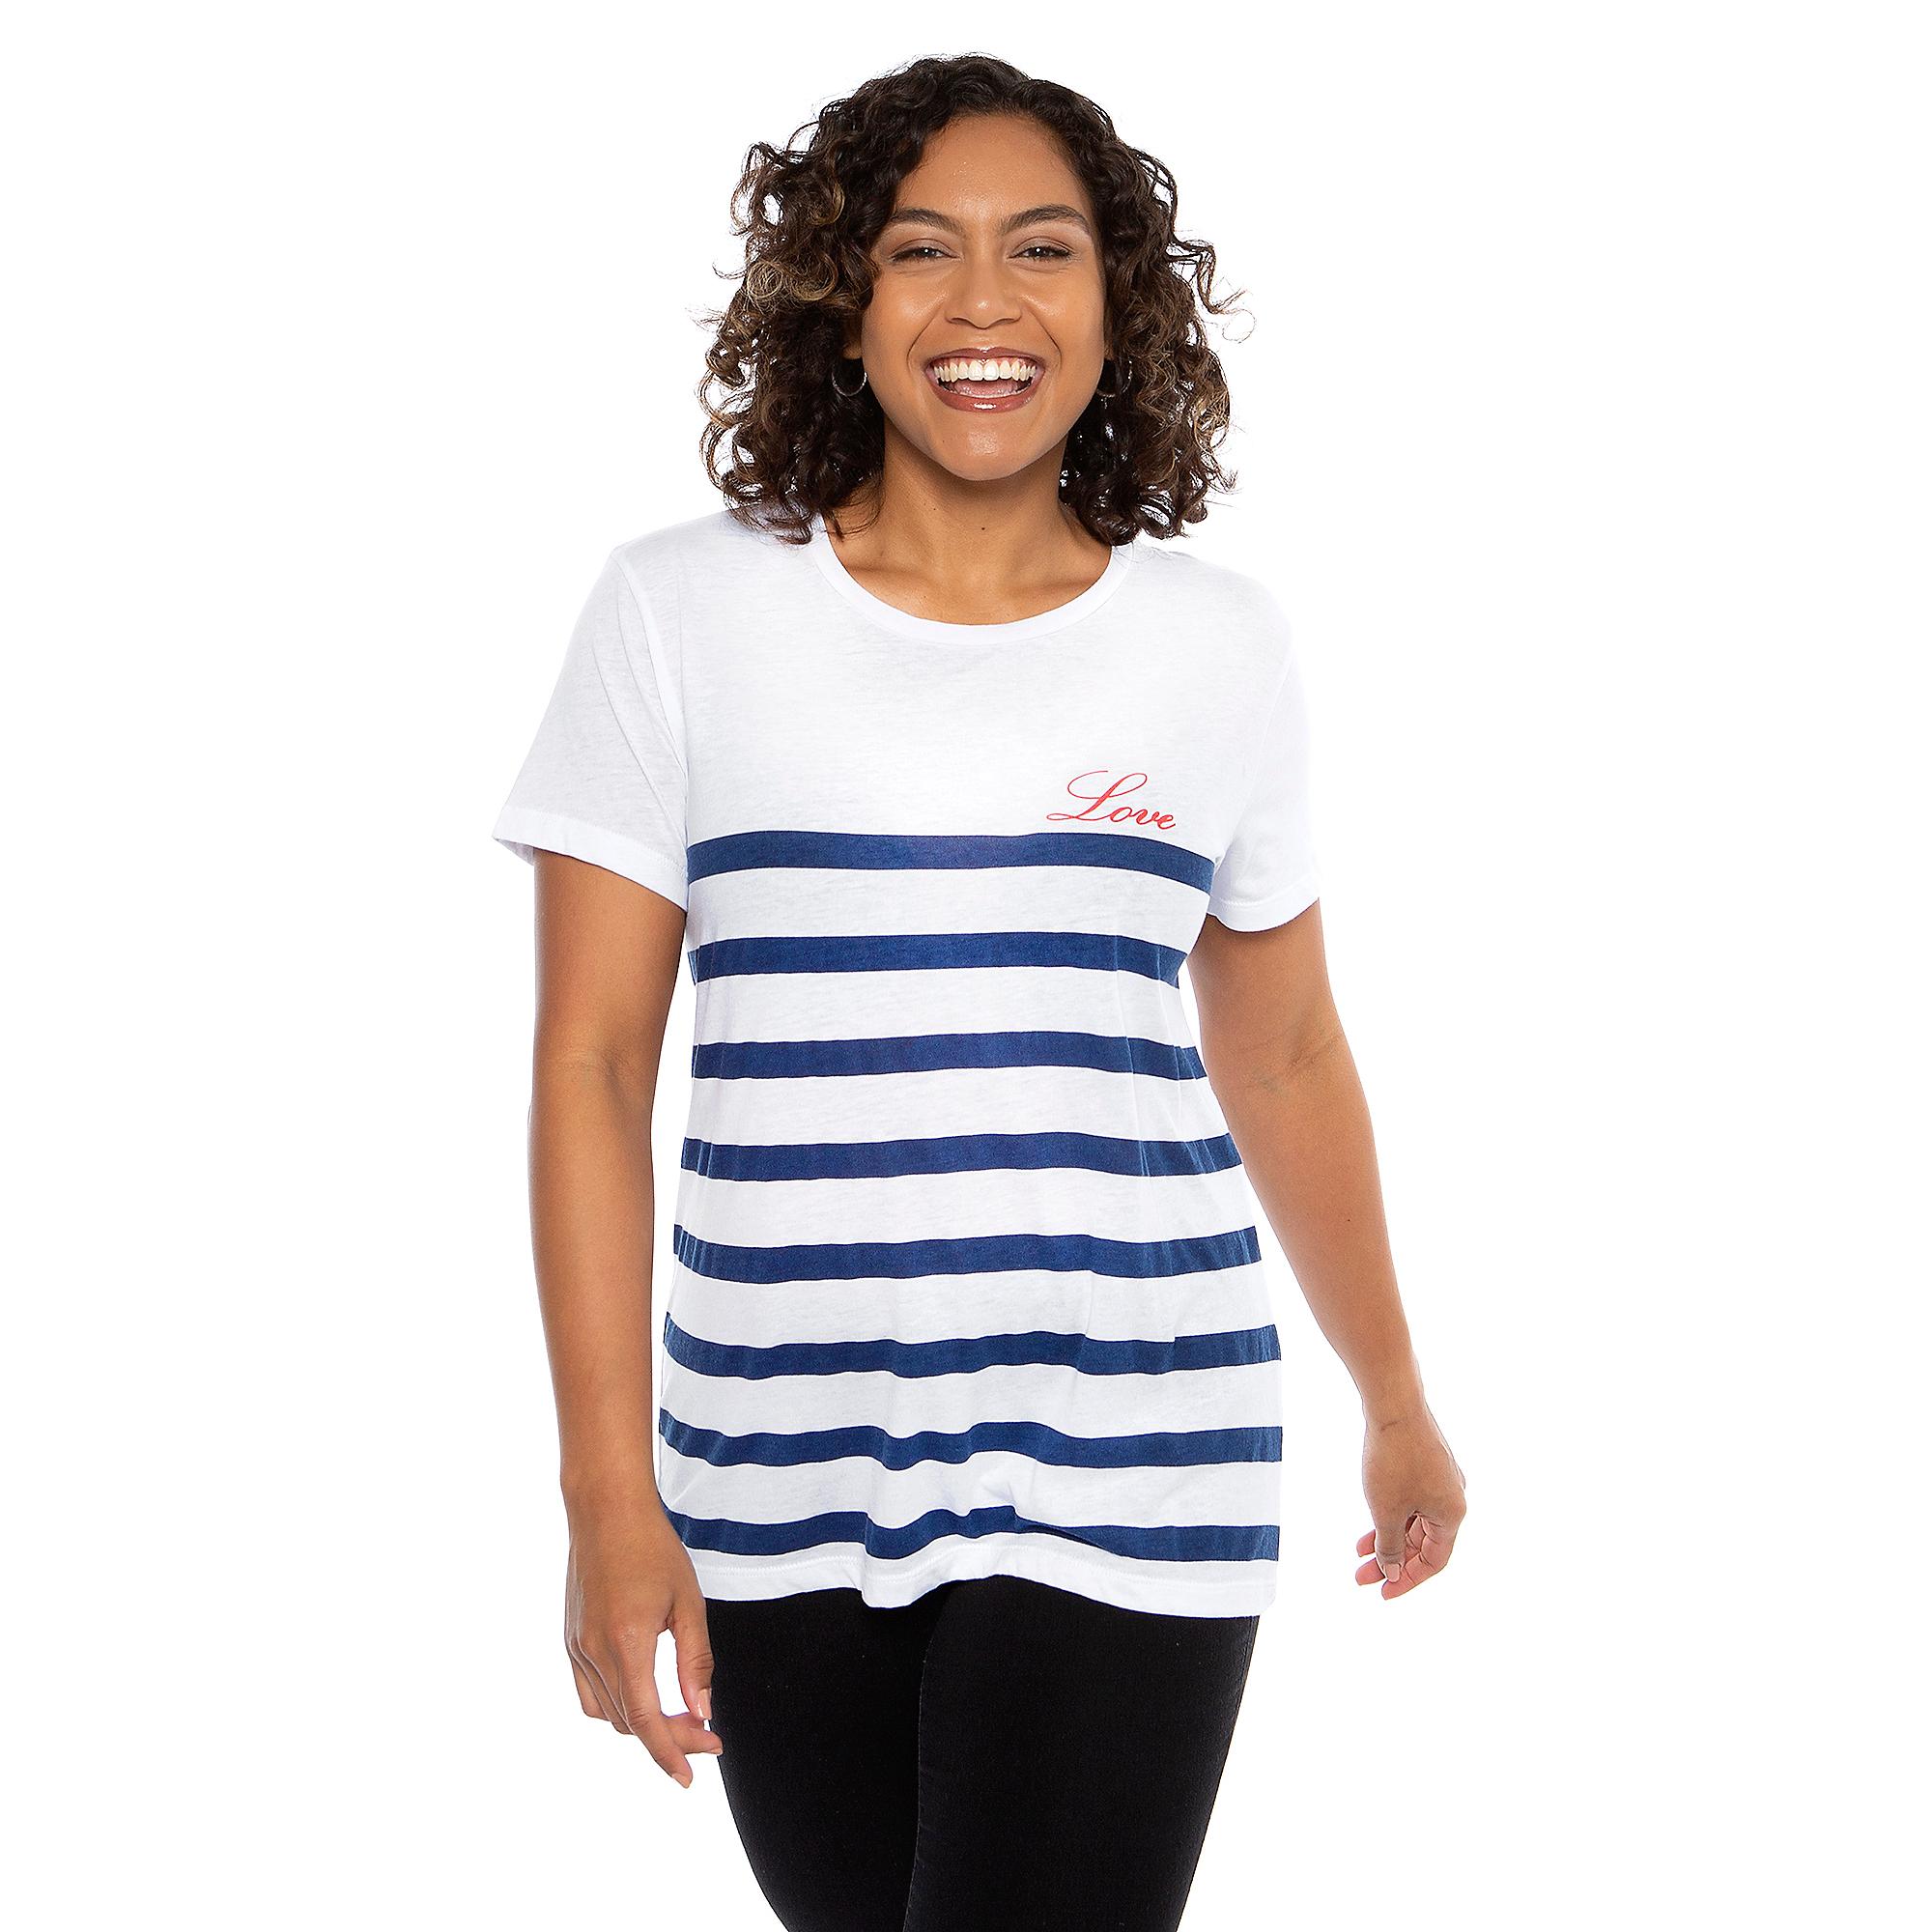 Studio Chaser Love Stripe Everybody Shirt